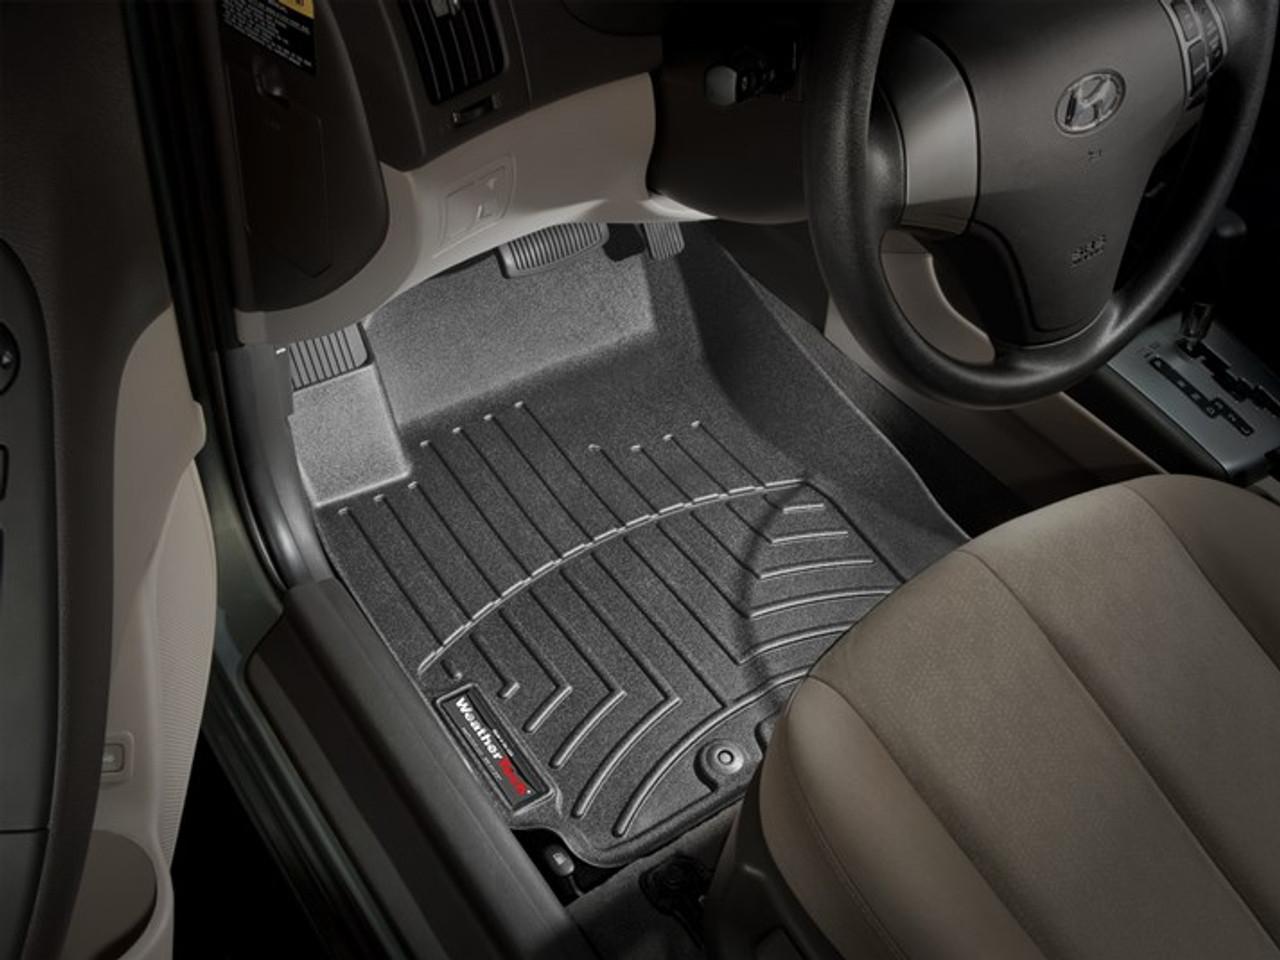 1st Row Black WeatherTech FloorLiner for Hyundai Elantra 2007-2010